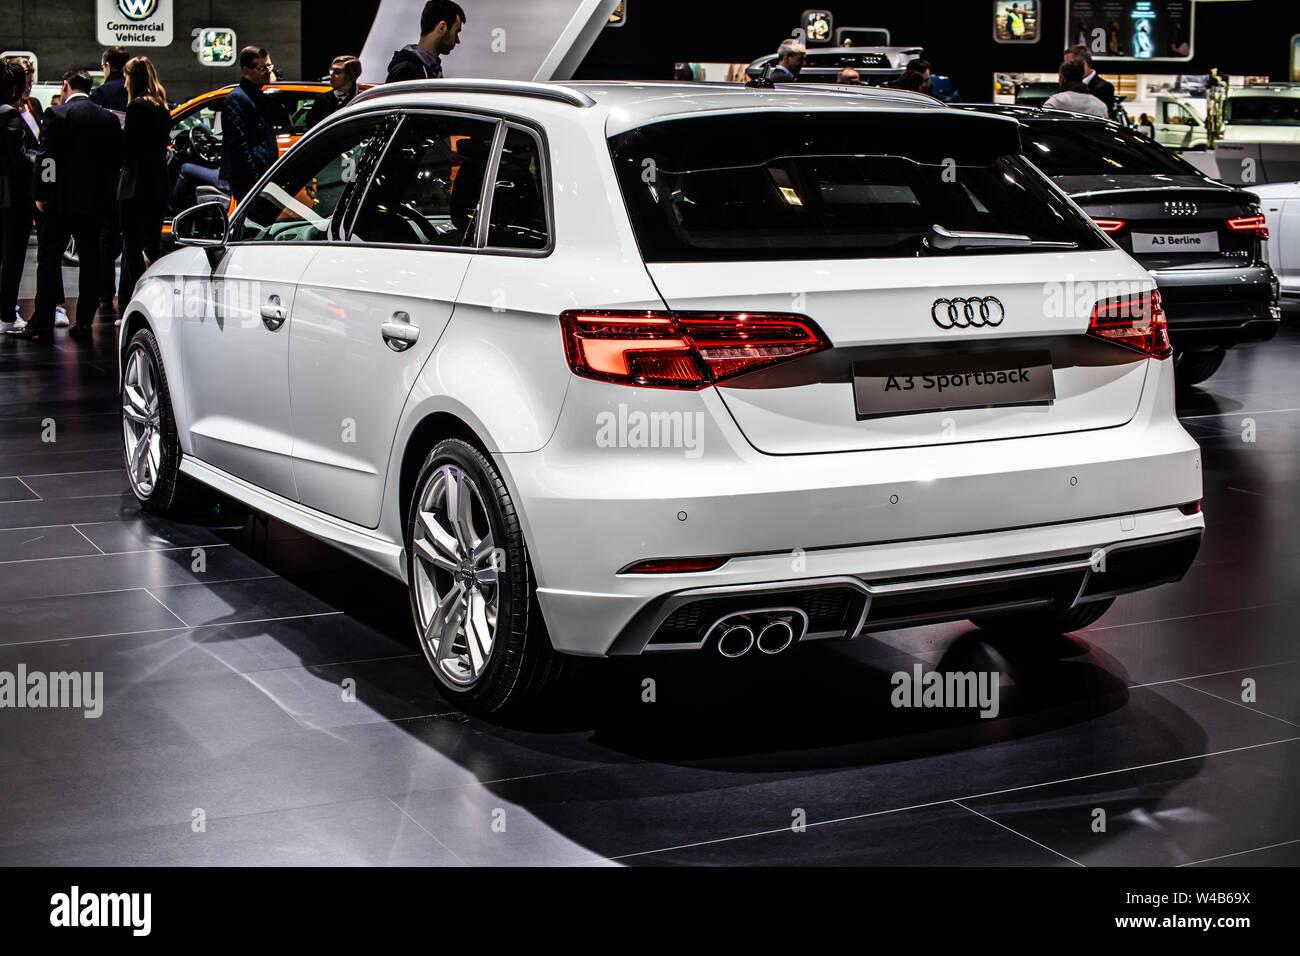 Kelebihan Audi A3 Sportback 2019 Tangguh